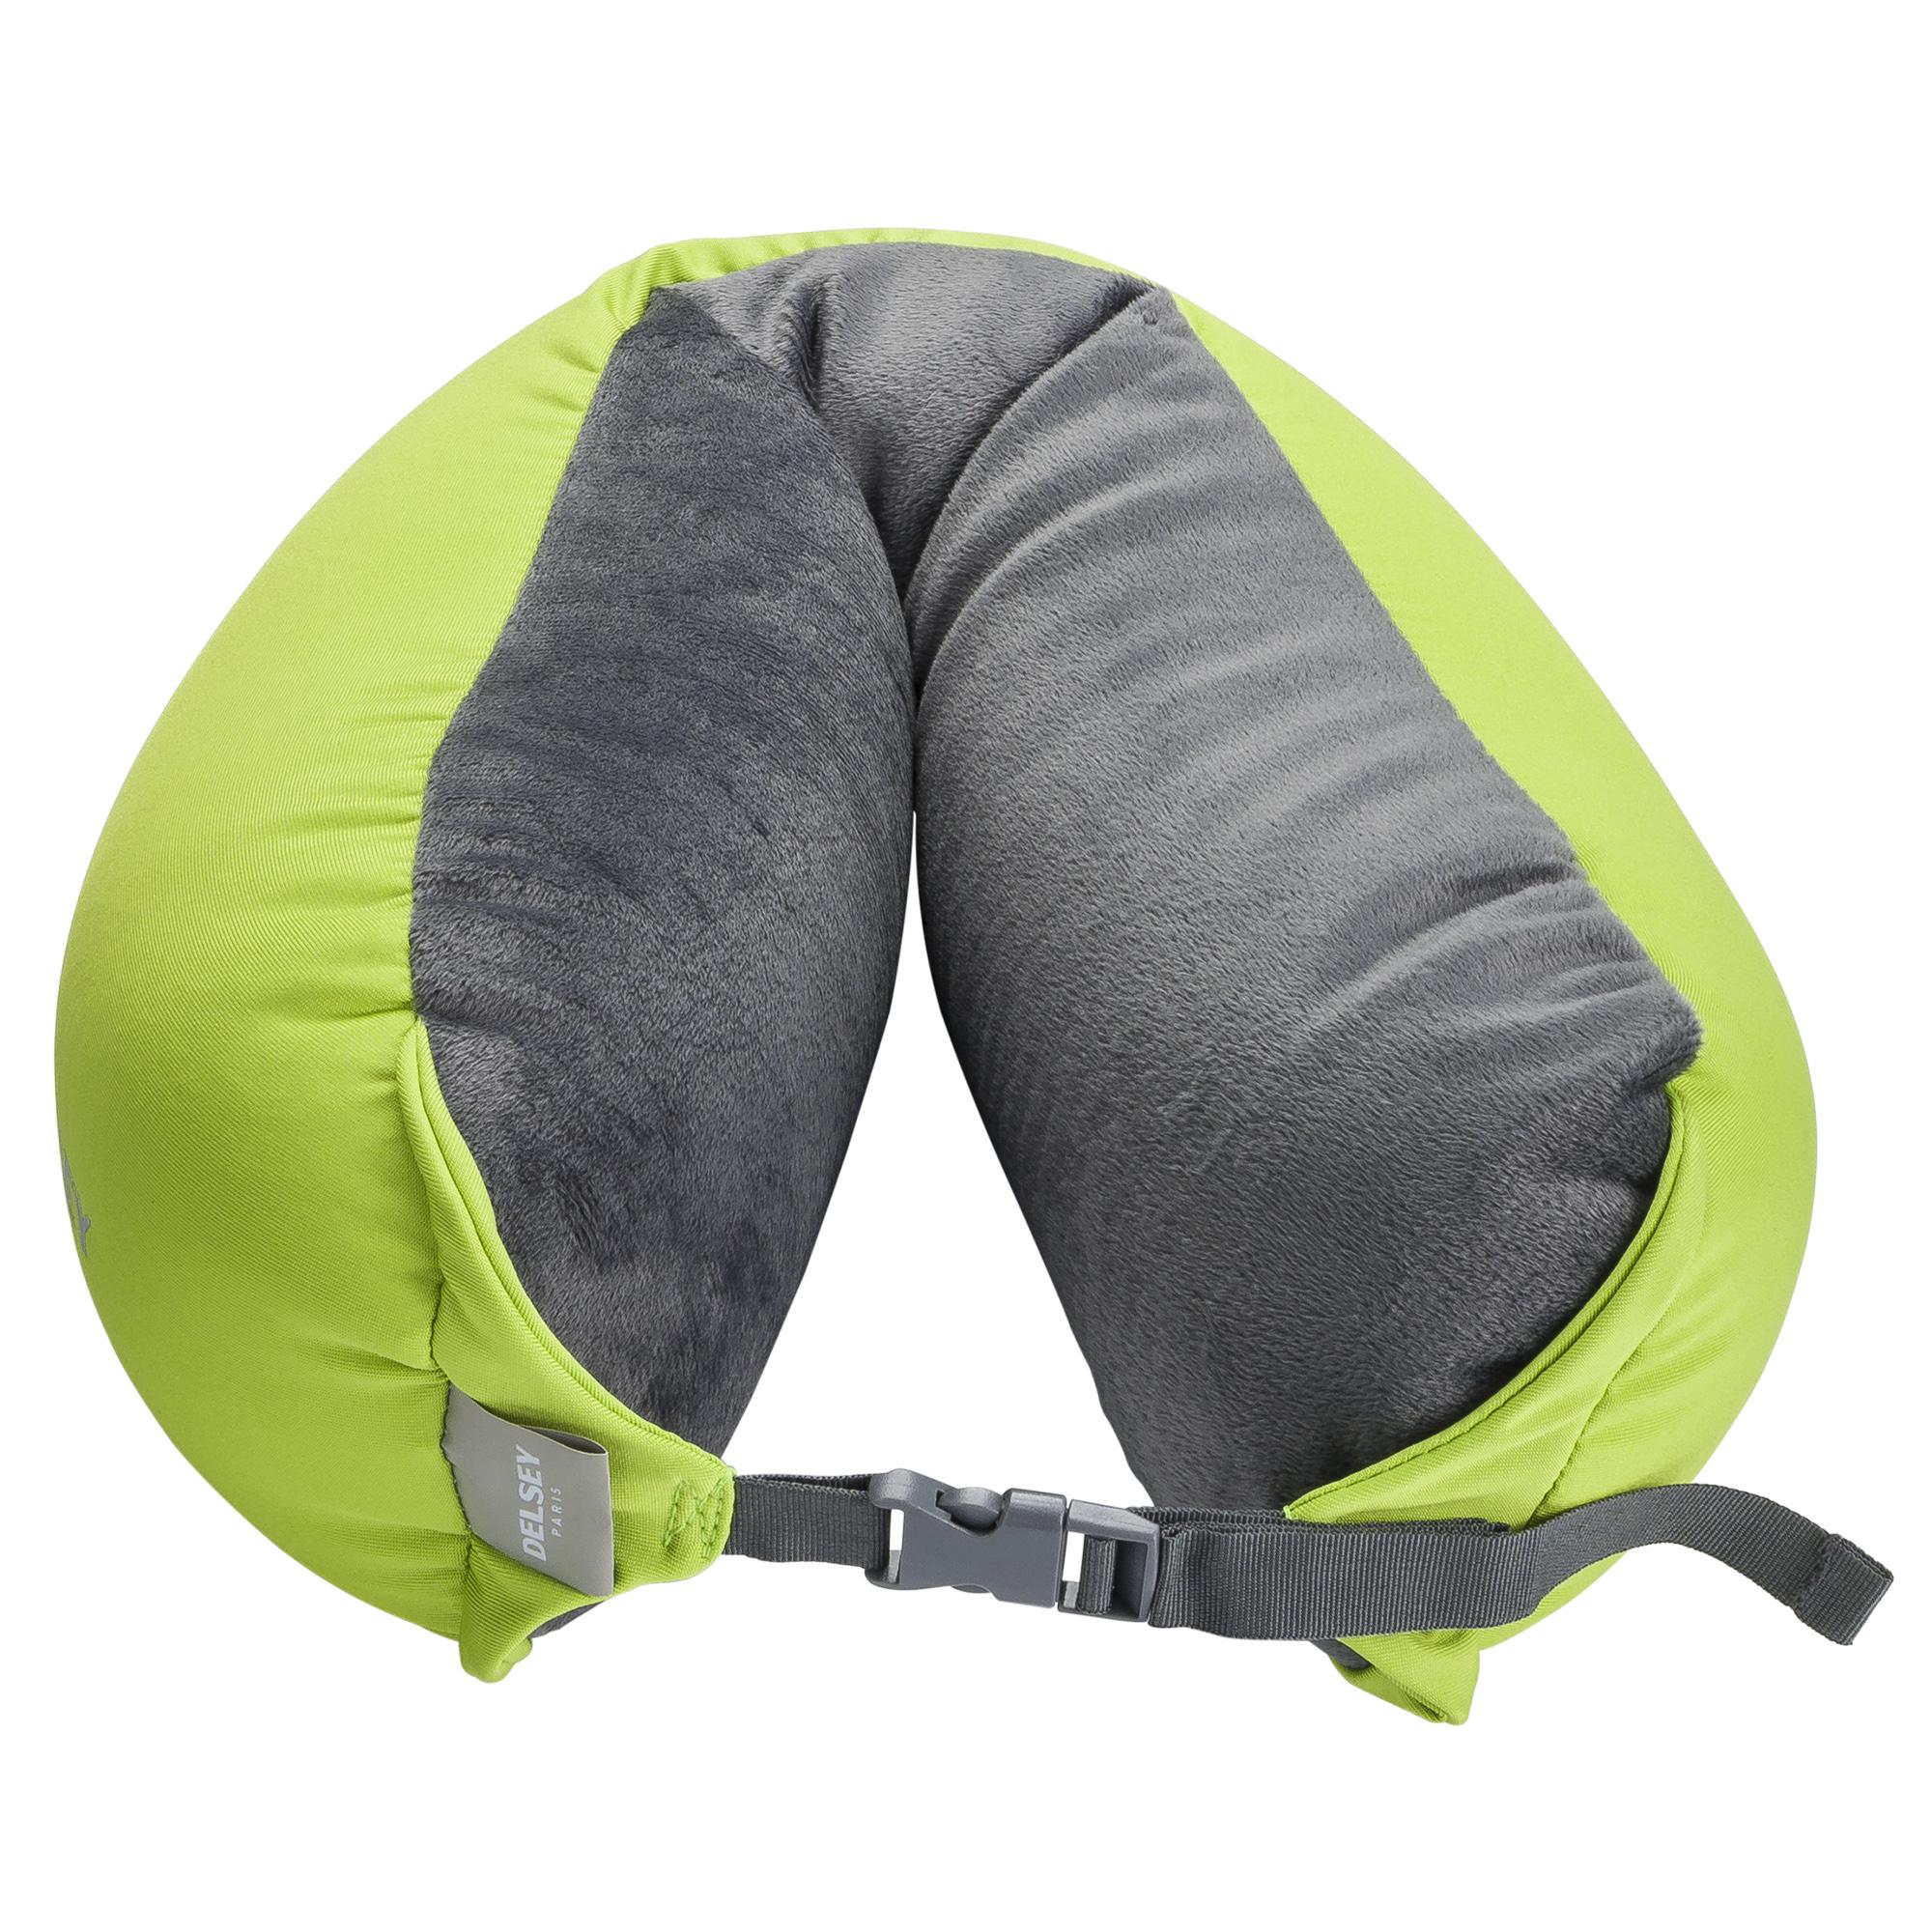 Ergonomic Multifunctional Travel Pillow